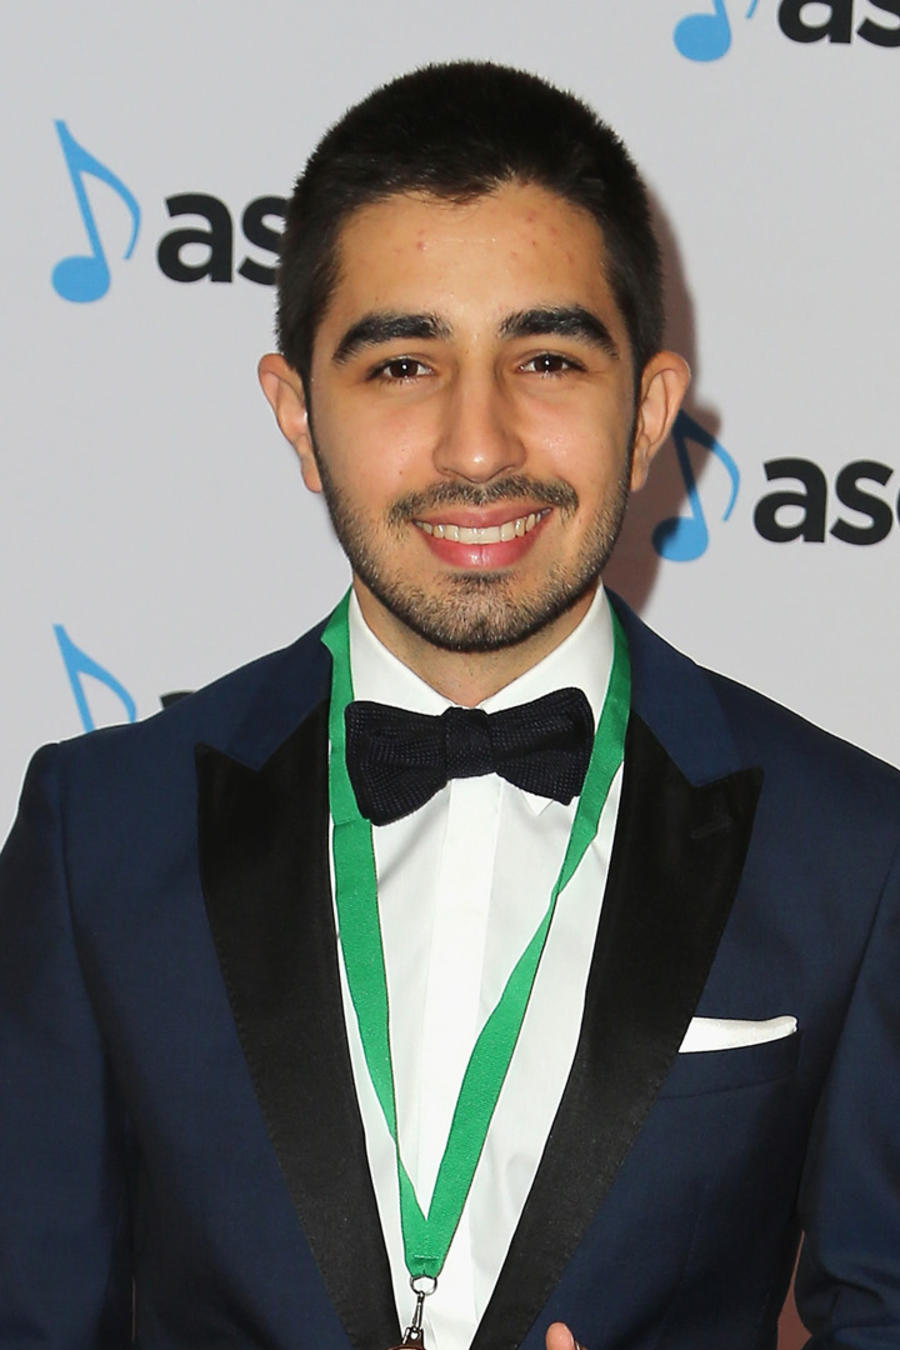 Joss Favela en el 2016 ASCAP Latin Music Awards